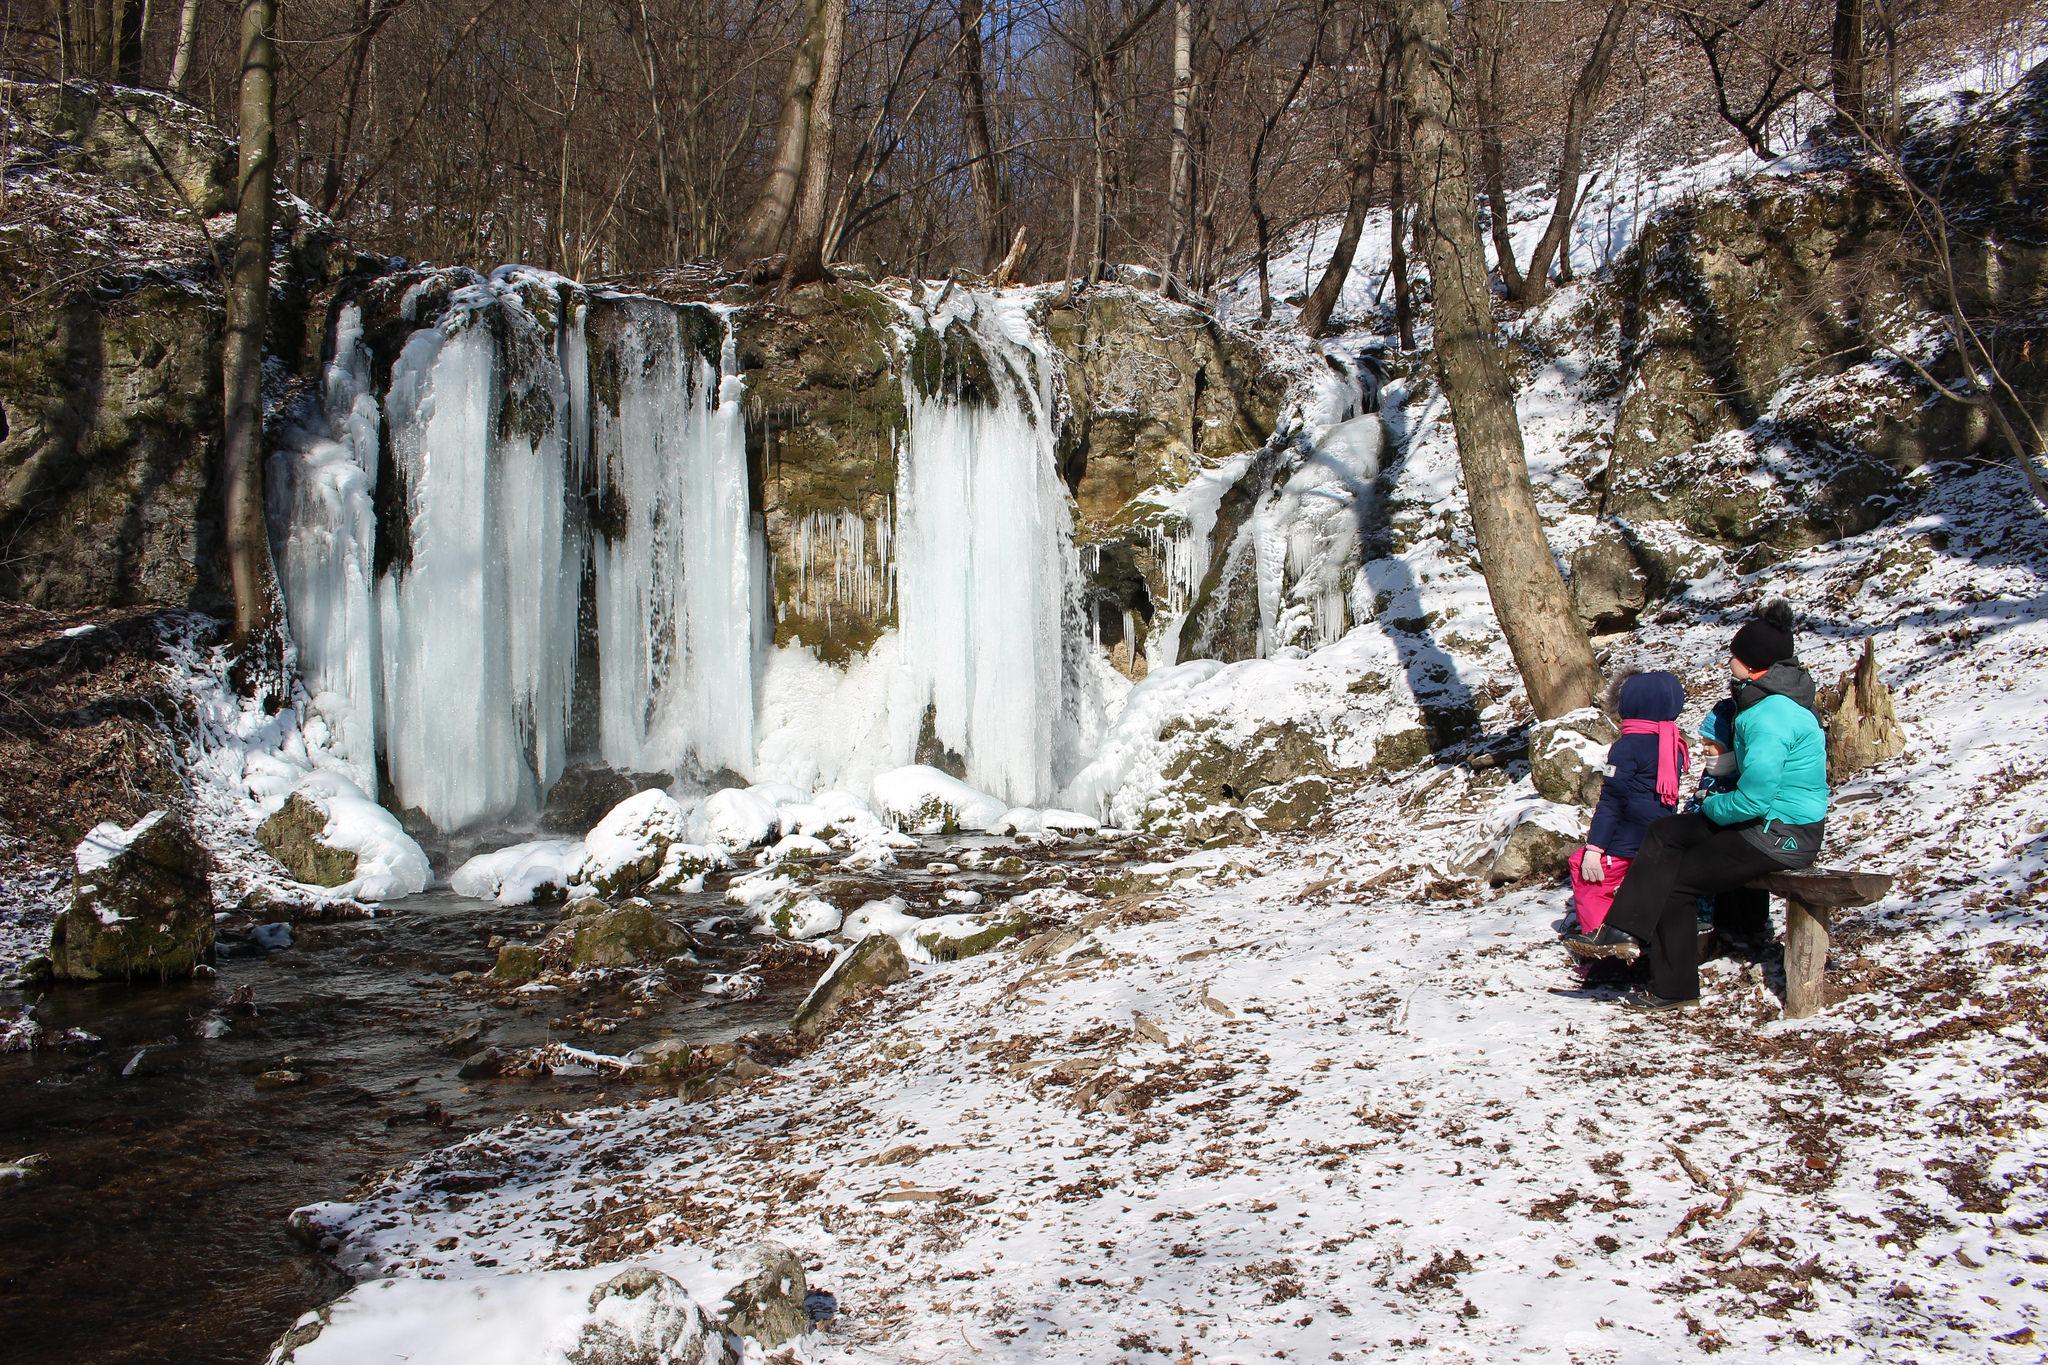 Hájske waterfalls, Slovak Karst National Park, Slovakia – 05